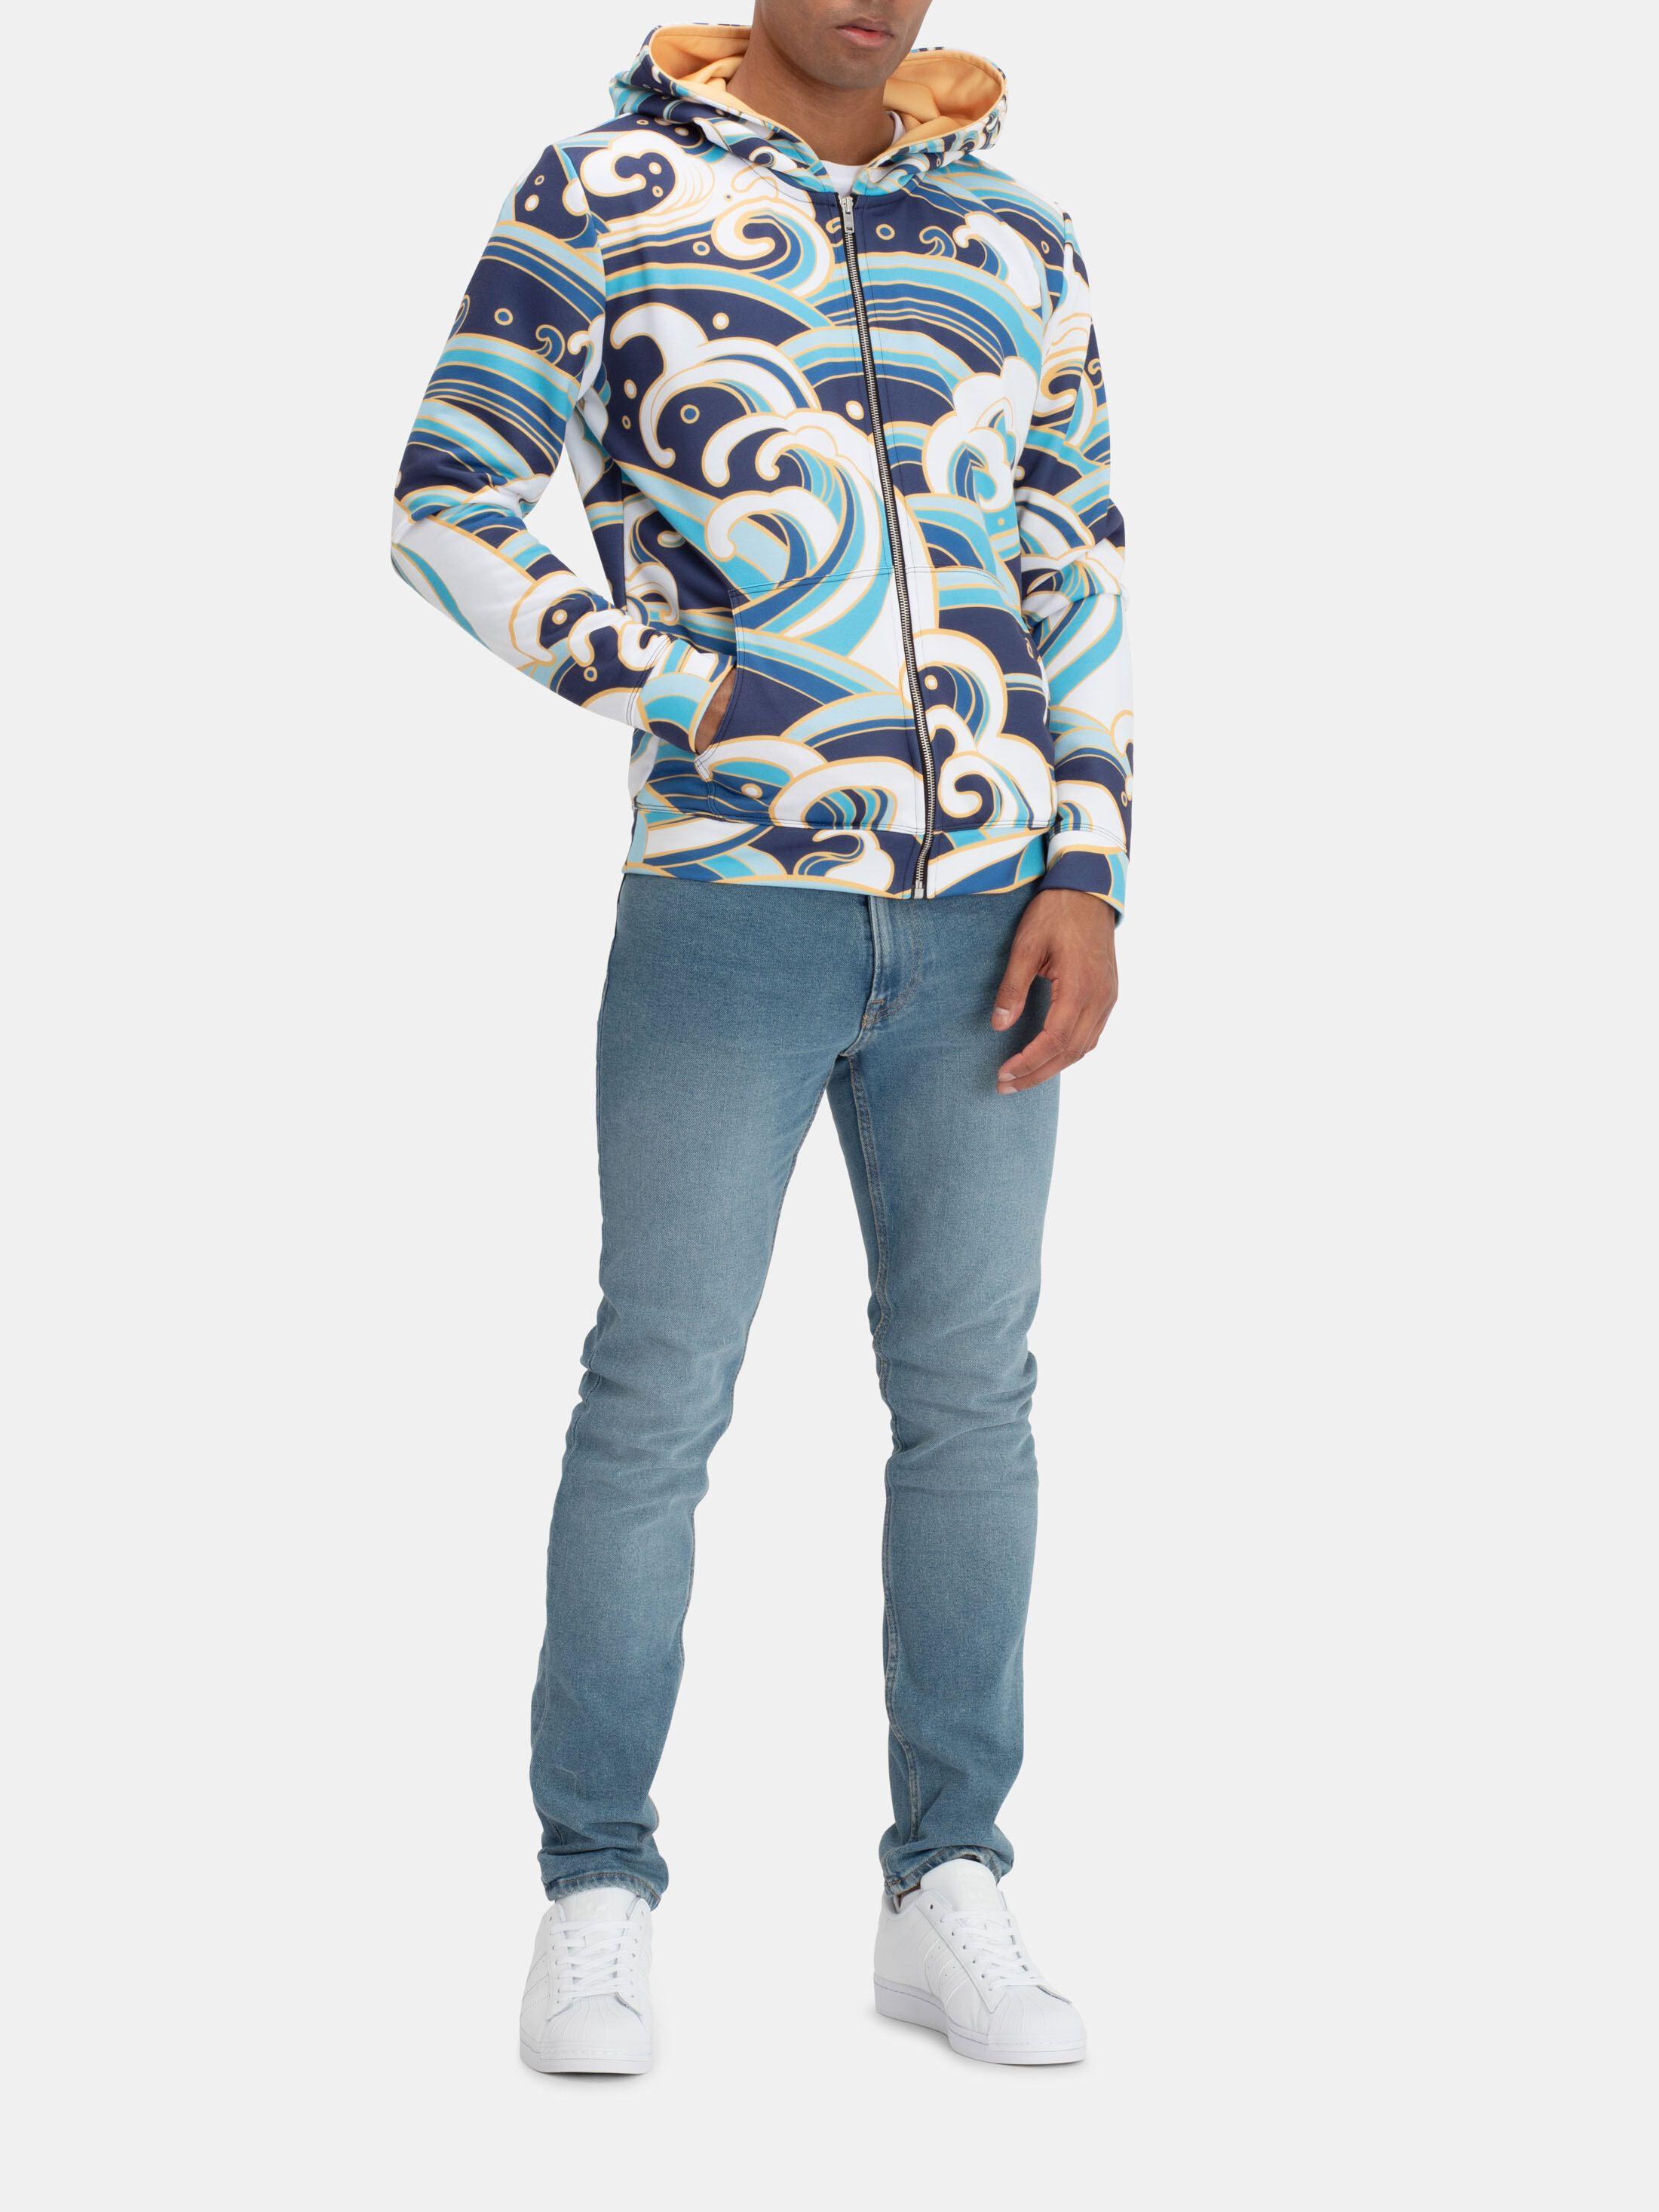 hoodies ontwerpen met rits